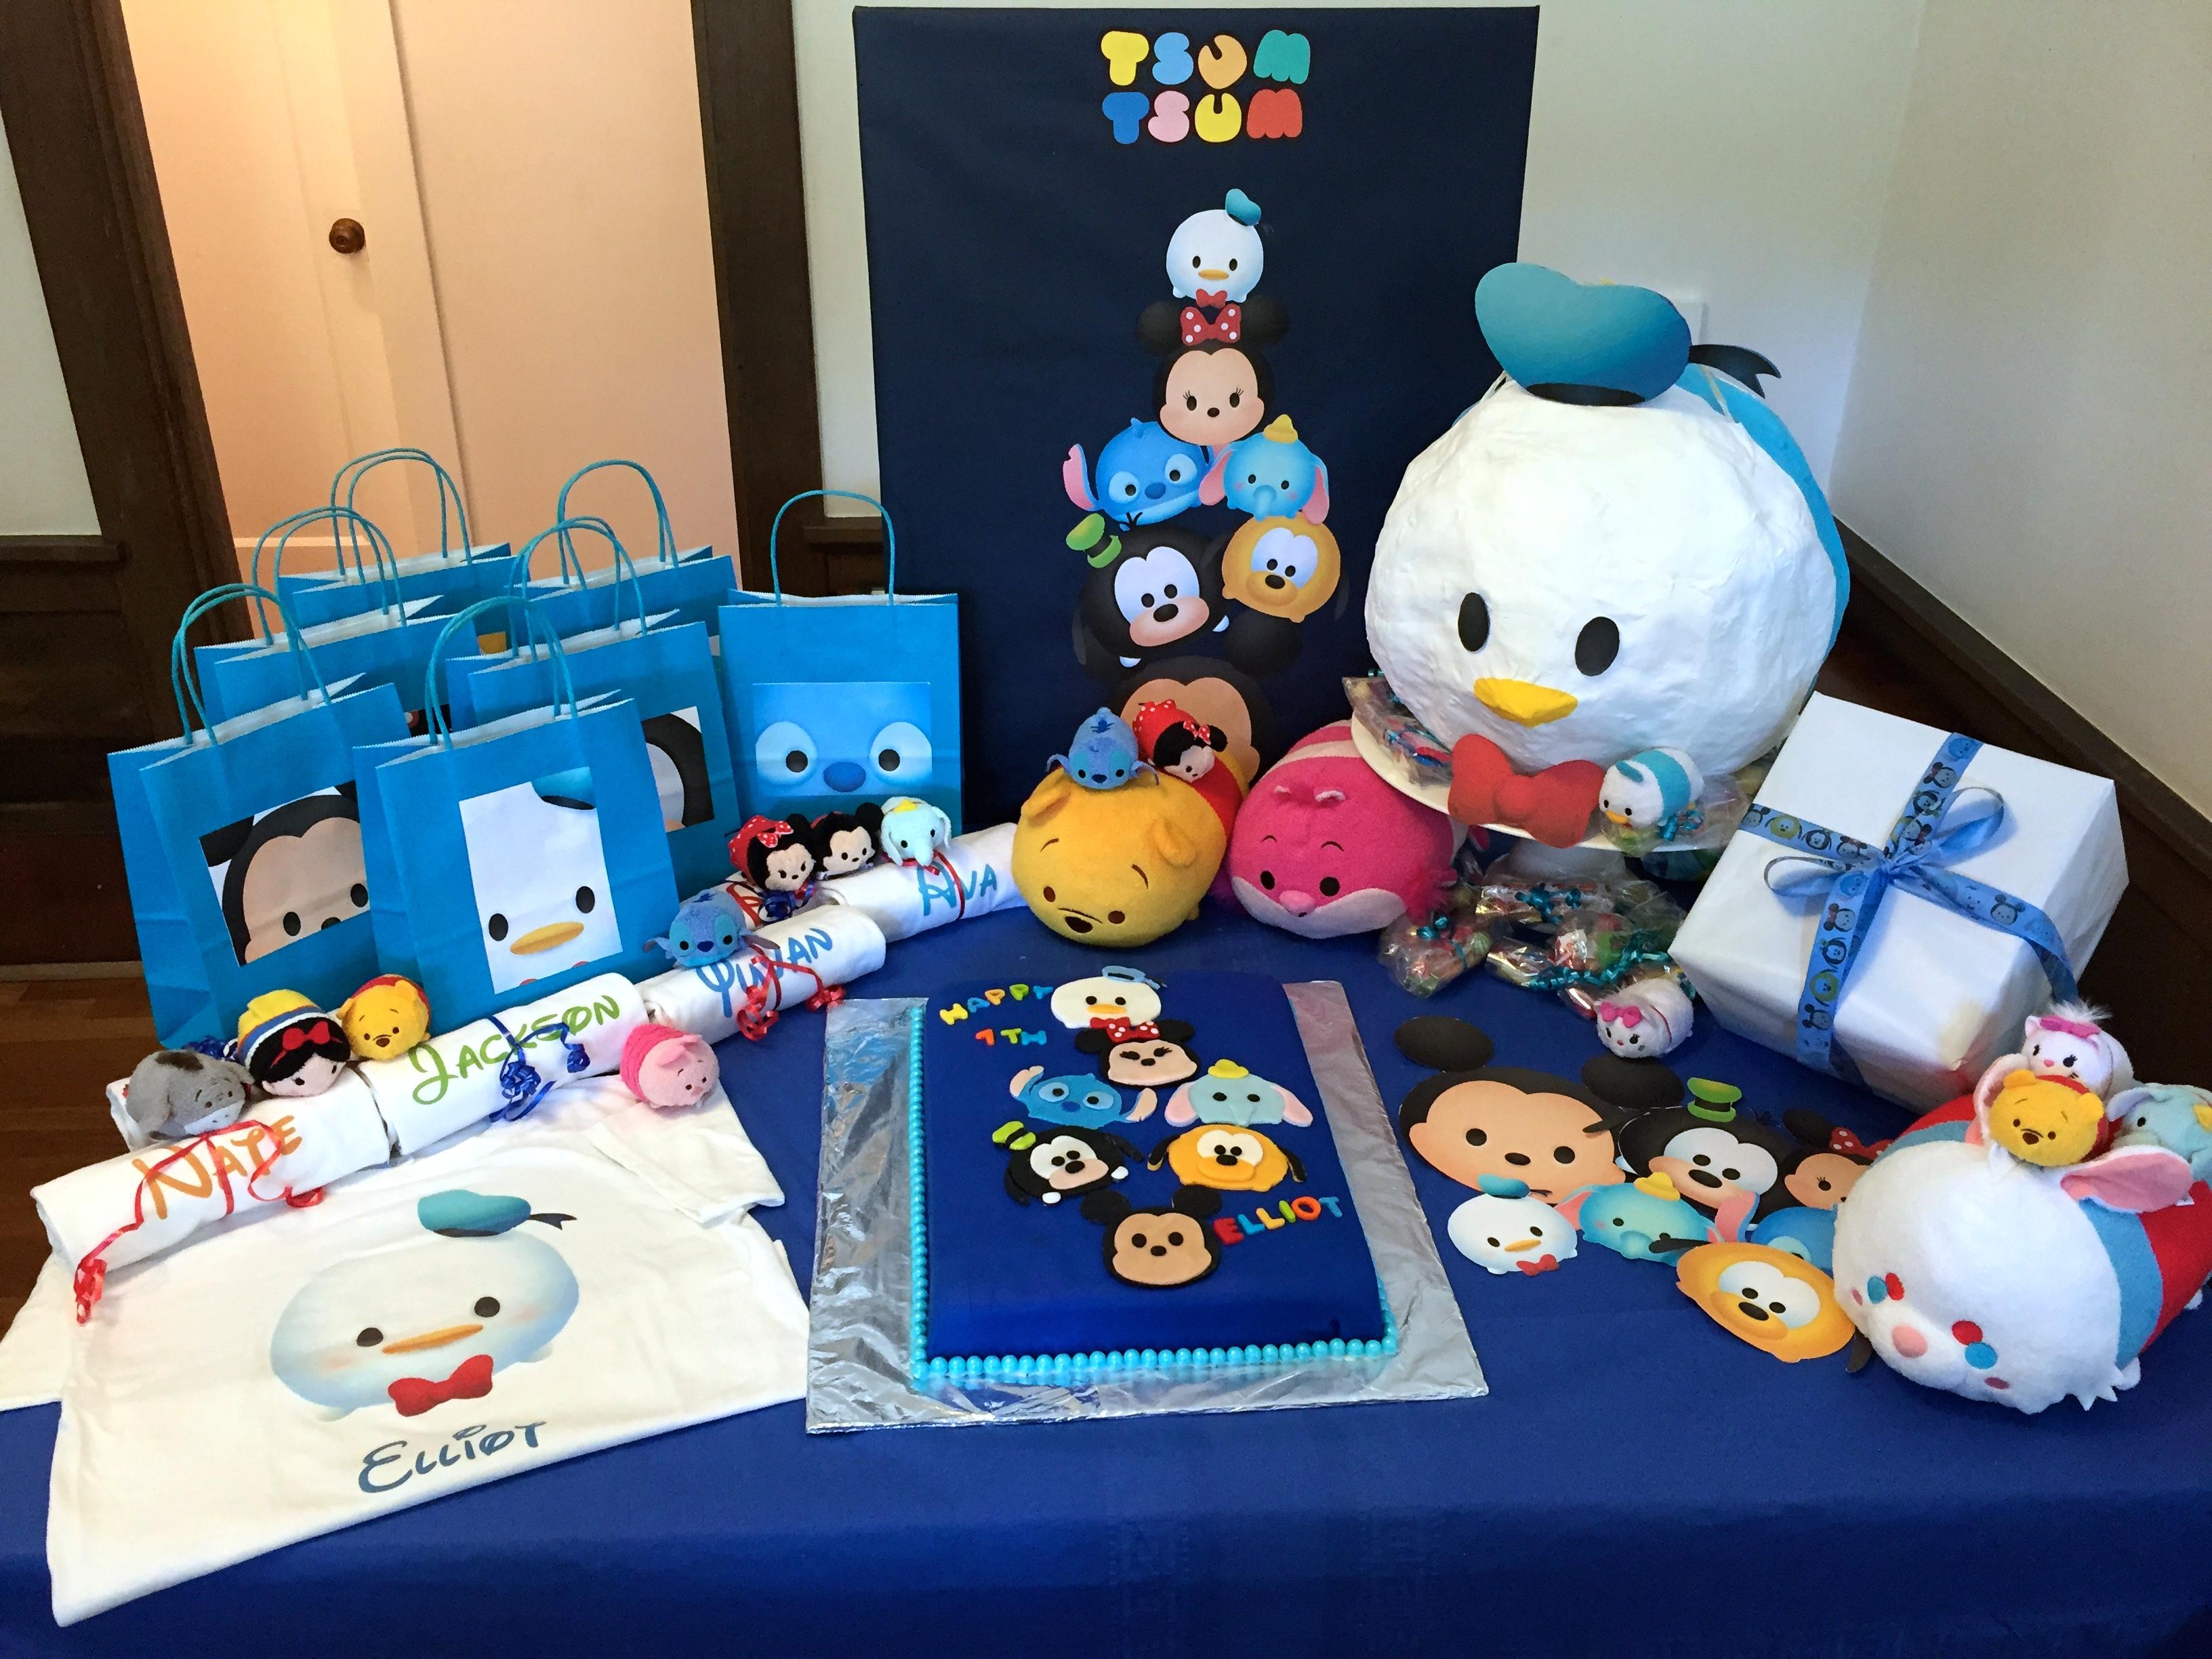 Tsum Tsum Ideas Para Fiestas: Making A Tsum Tsum Birthday Party!